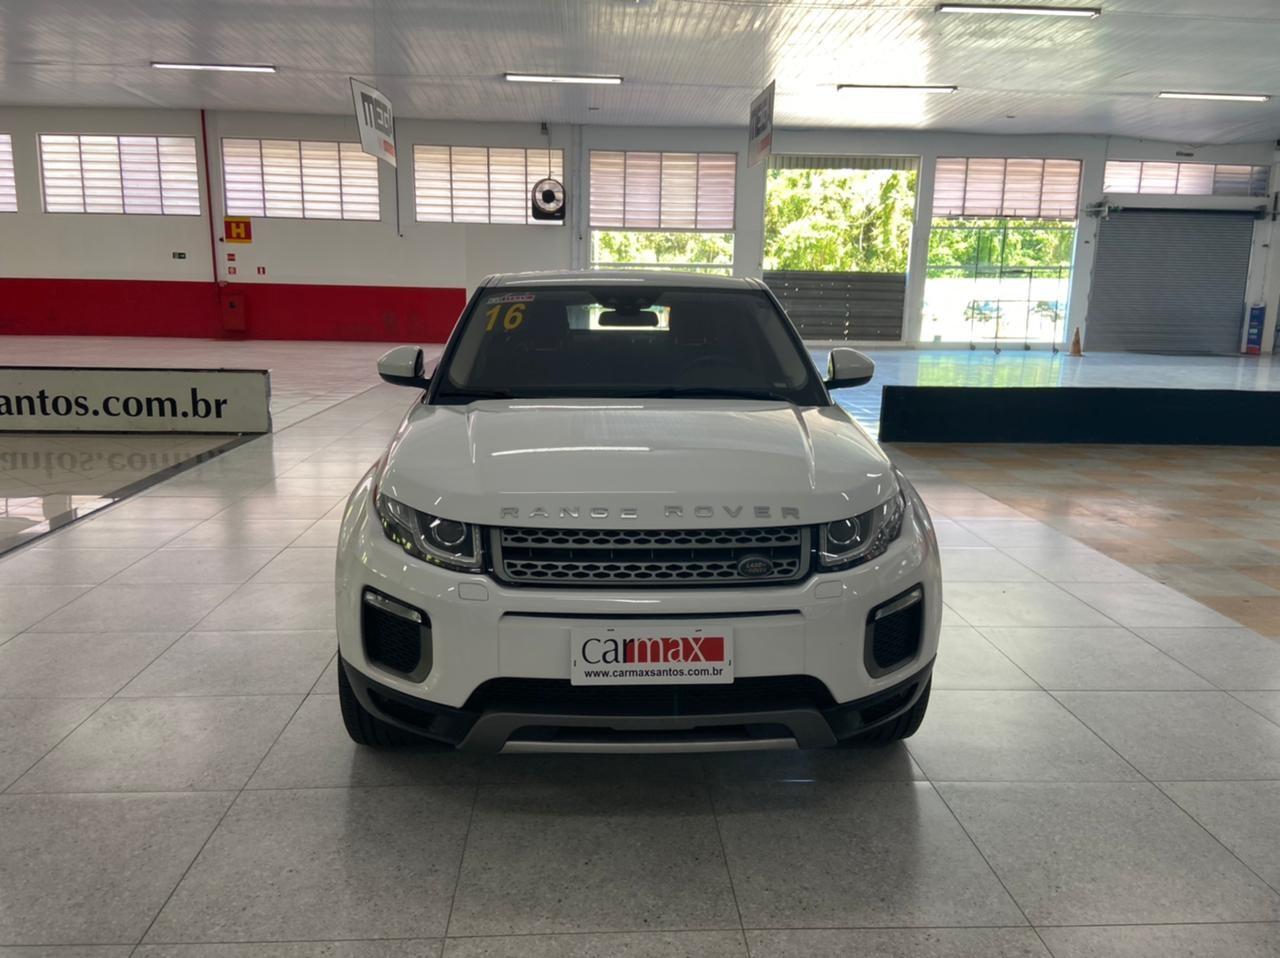 //www.autoline.com.br/carro/land-rover/range-rover-evoque-20-hse-16v-diesel-4p-4x4-turbo-automatico/2016/sao-vicente-sp/14457196